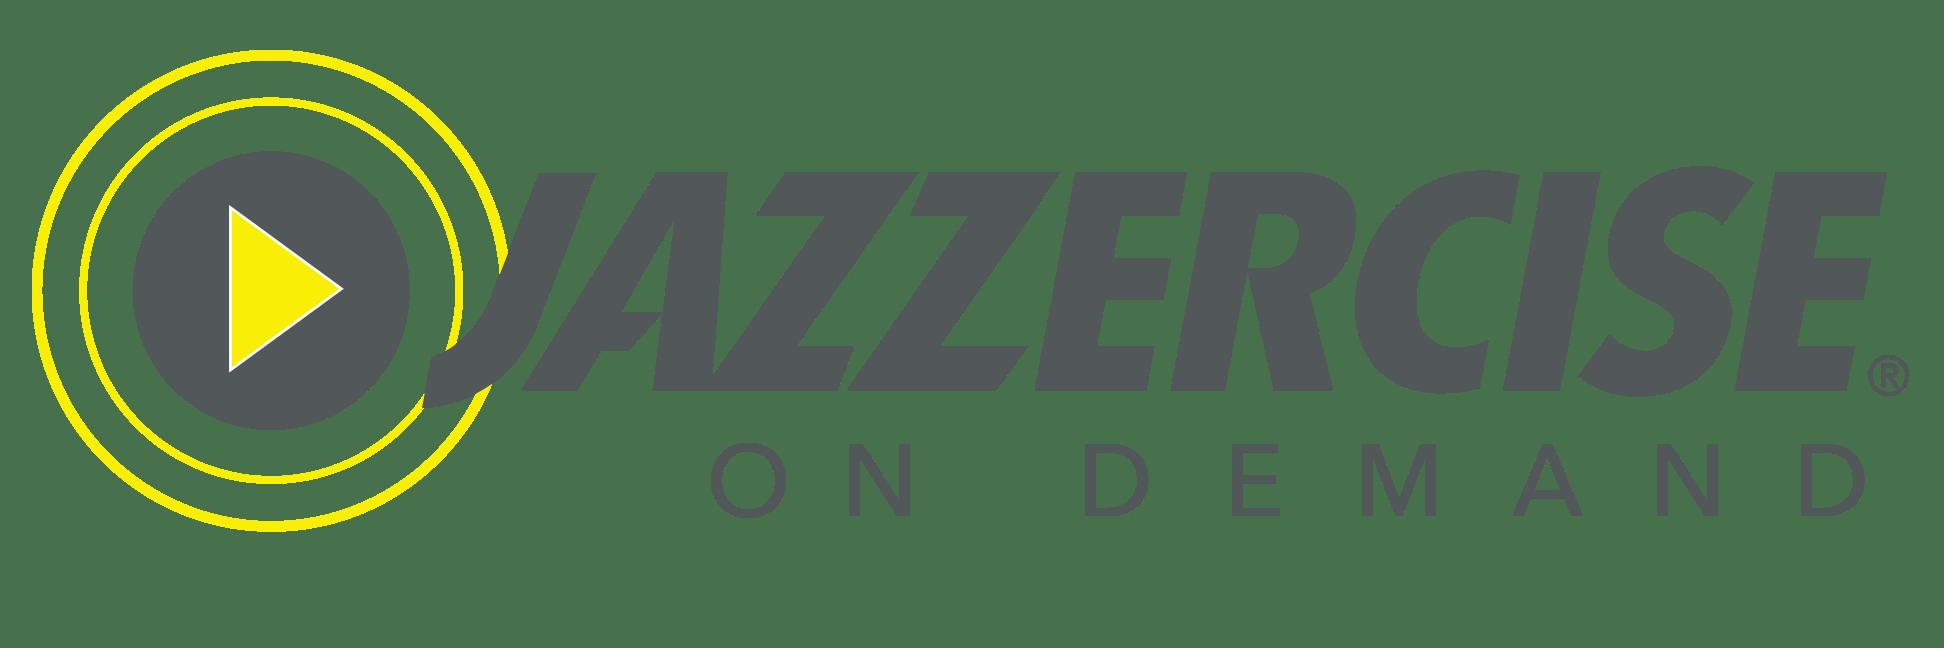 www jazzercise com login